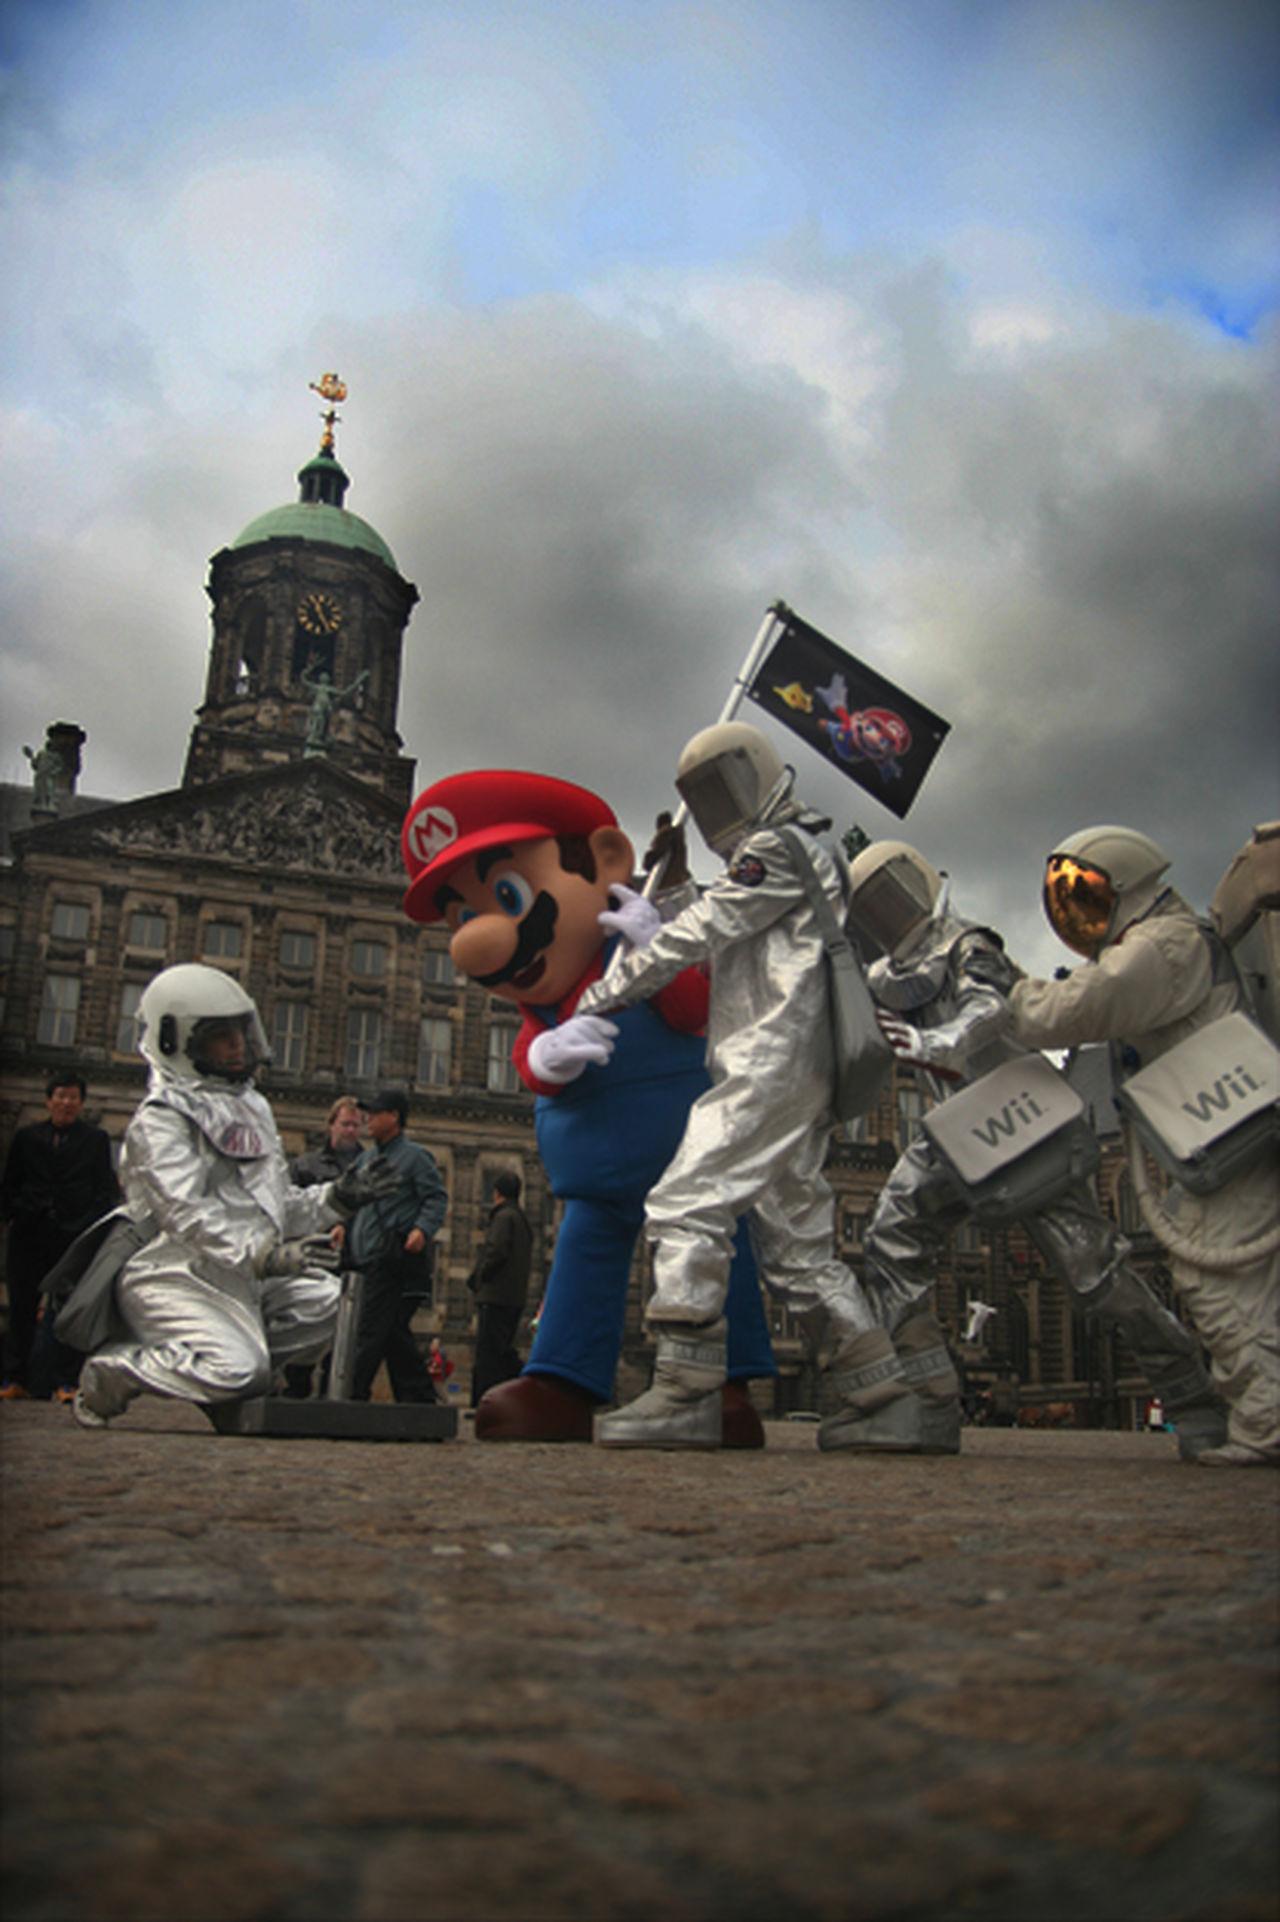 Amsterdam Mario Nintendo Nintendolife Nisute Europe Press Event Press Photography Super Mario